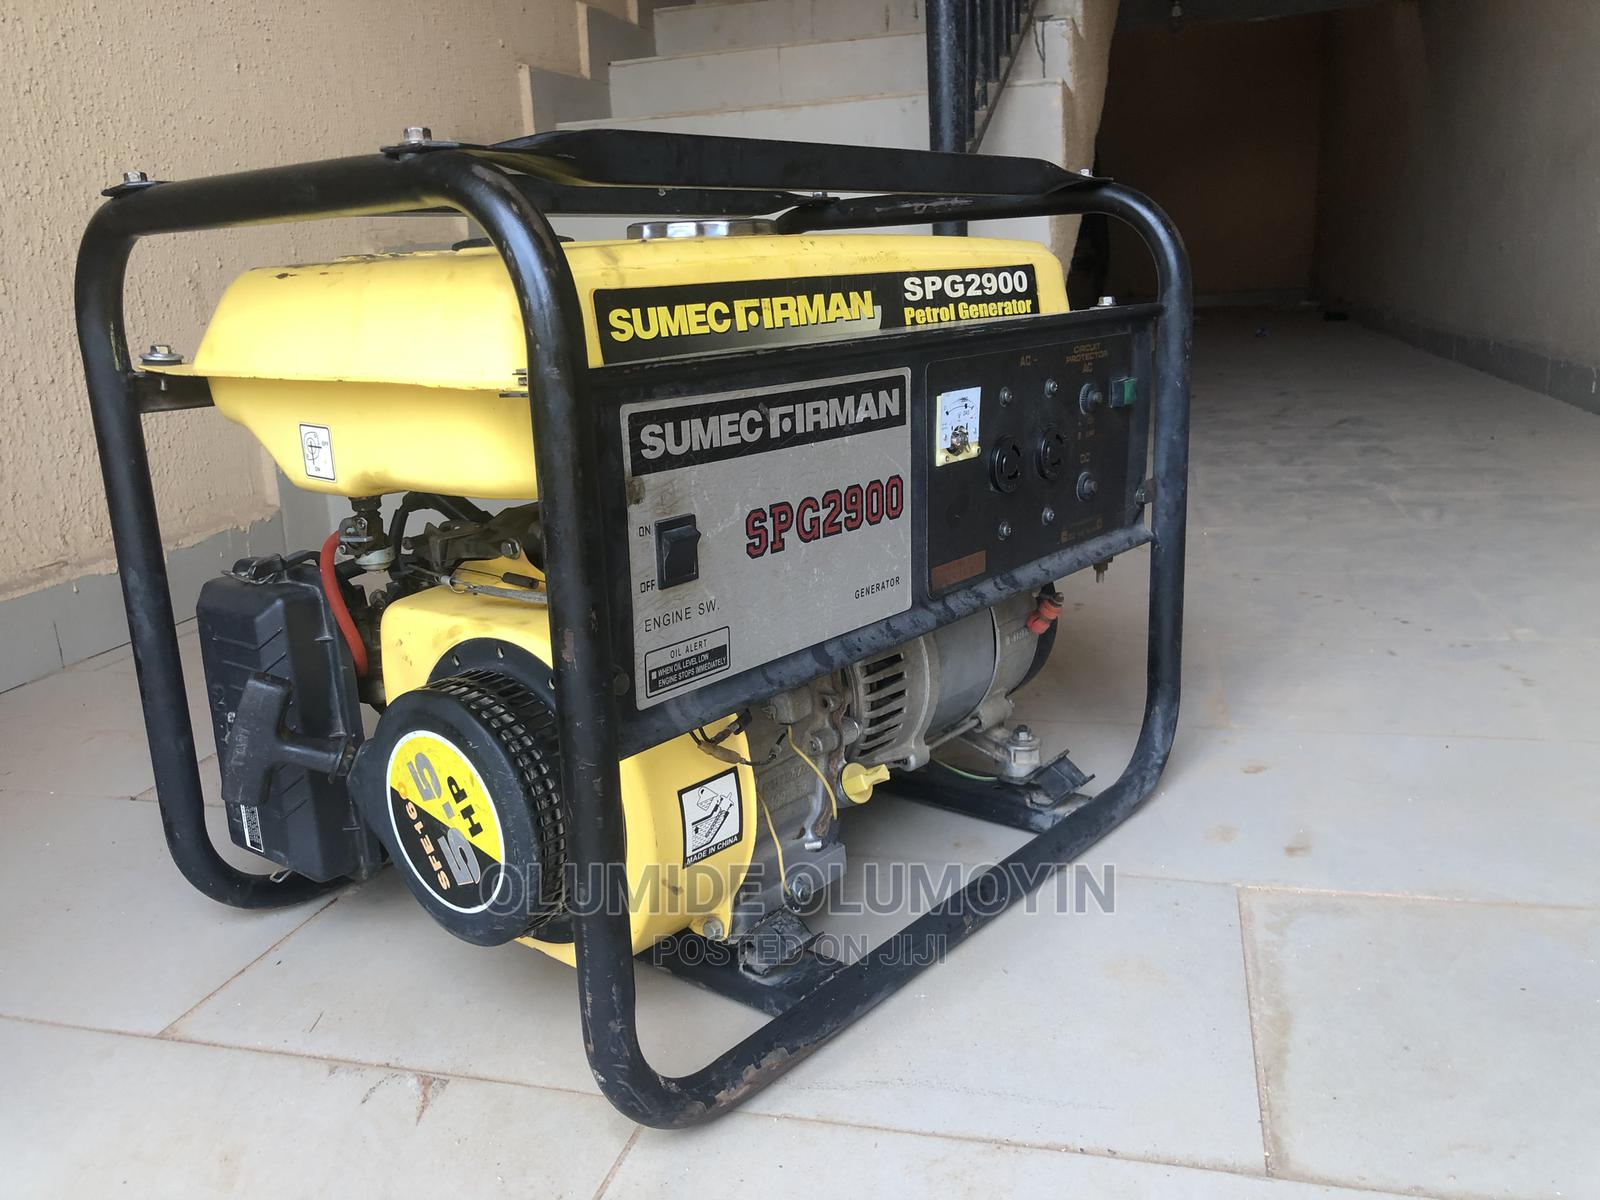 Neatly Used Sumec Firman Generator for Sale